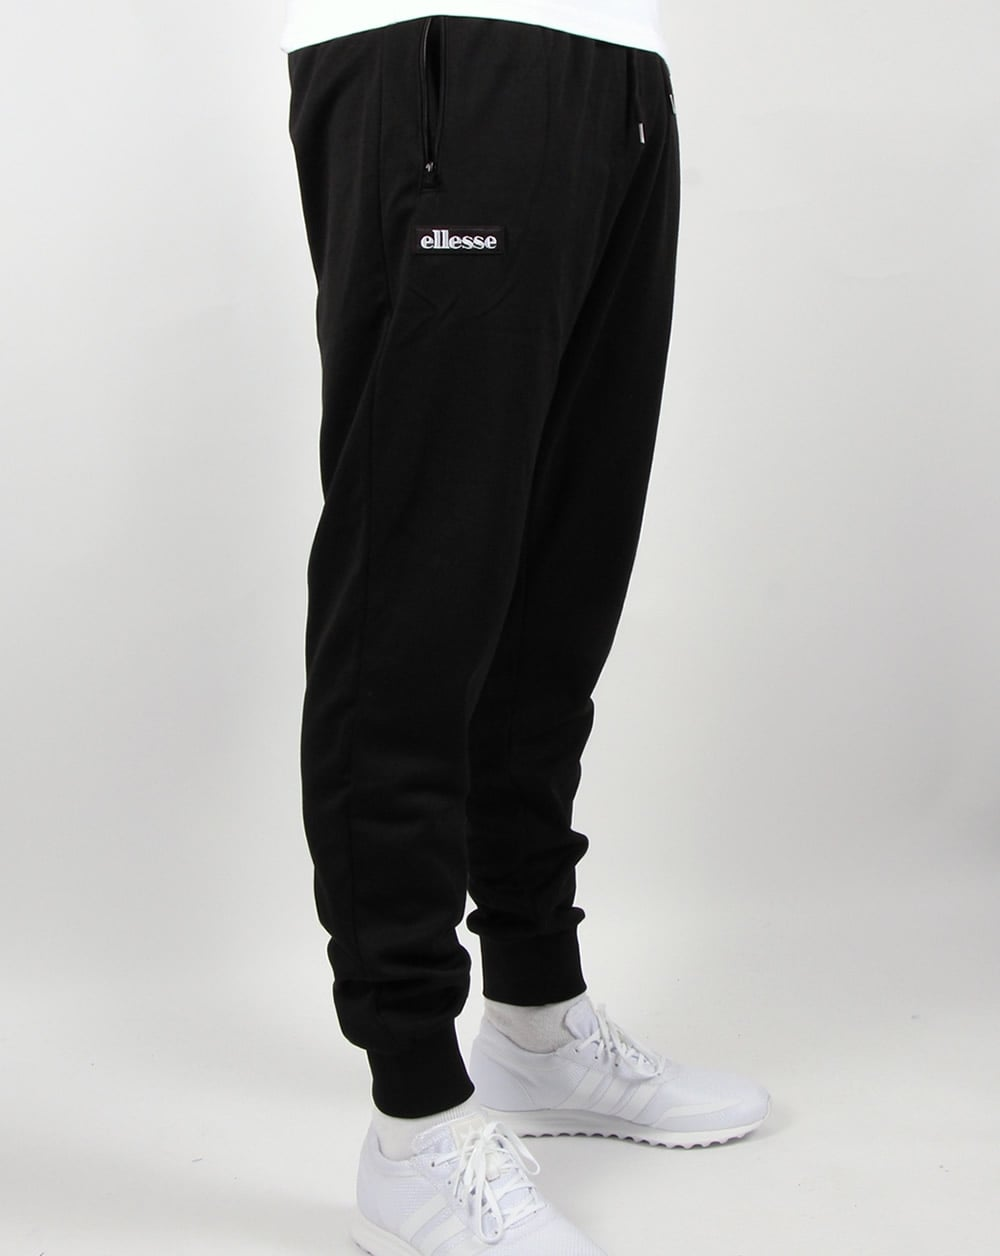 ee6e36c52c Ellesse Bertone Track Pants Black